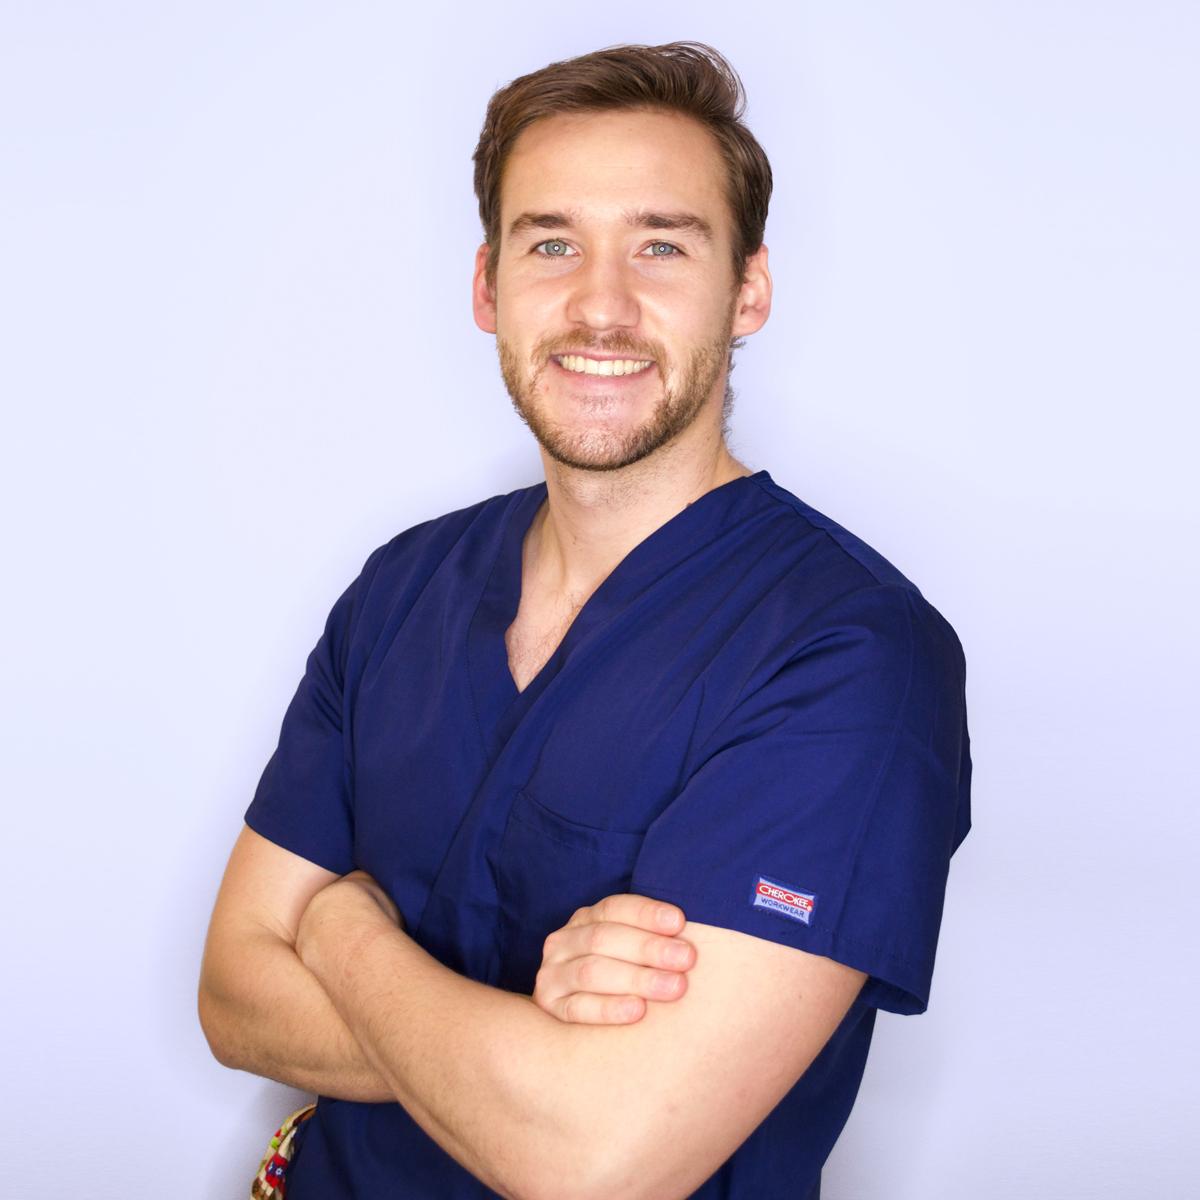 Dr. Hendrik Smits